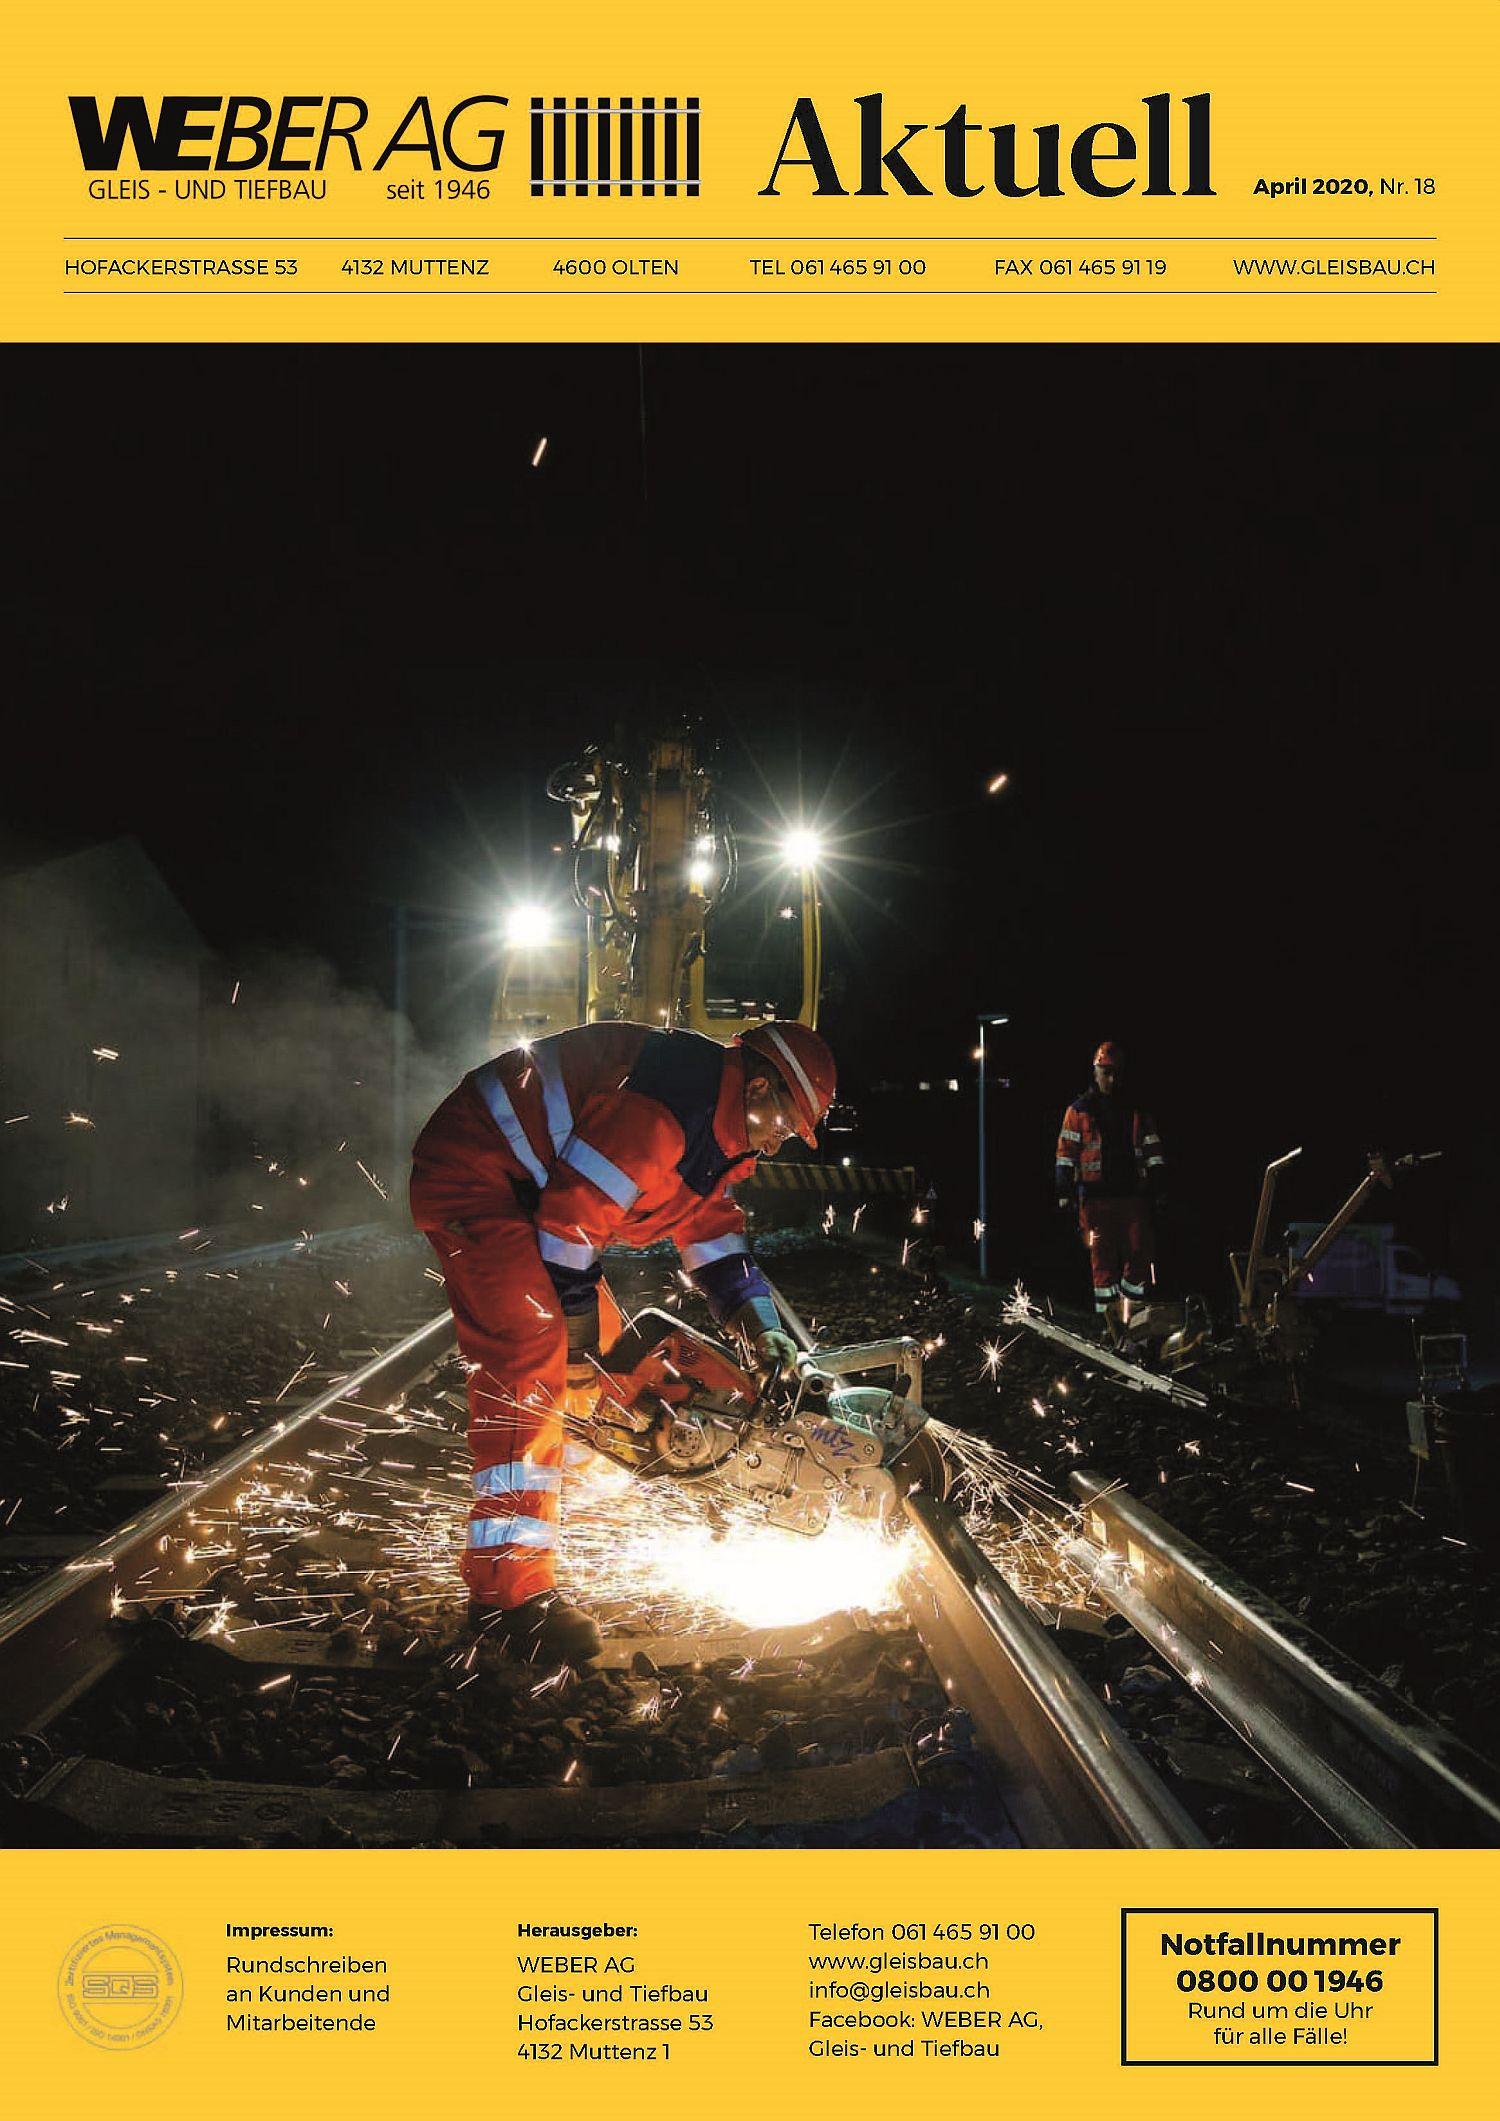 WEBER AG Aktuell: Ausgabe 18 – WEBER AG mit neuer Unternehmensleitung